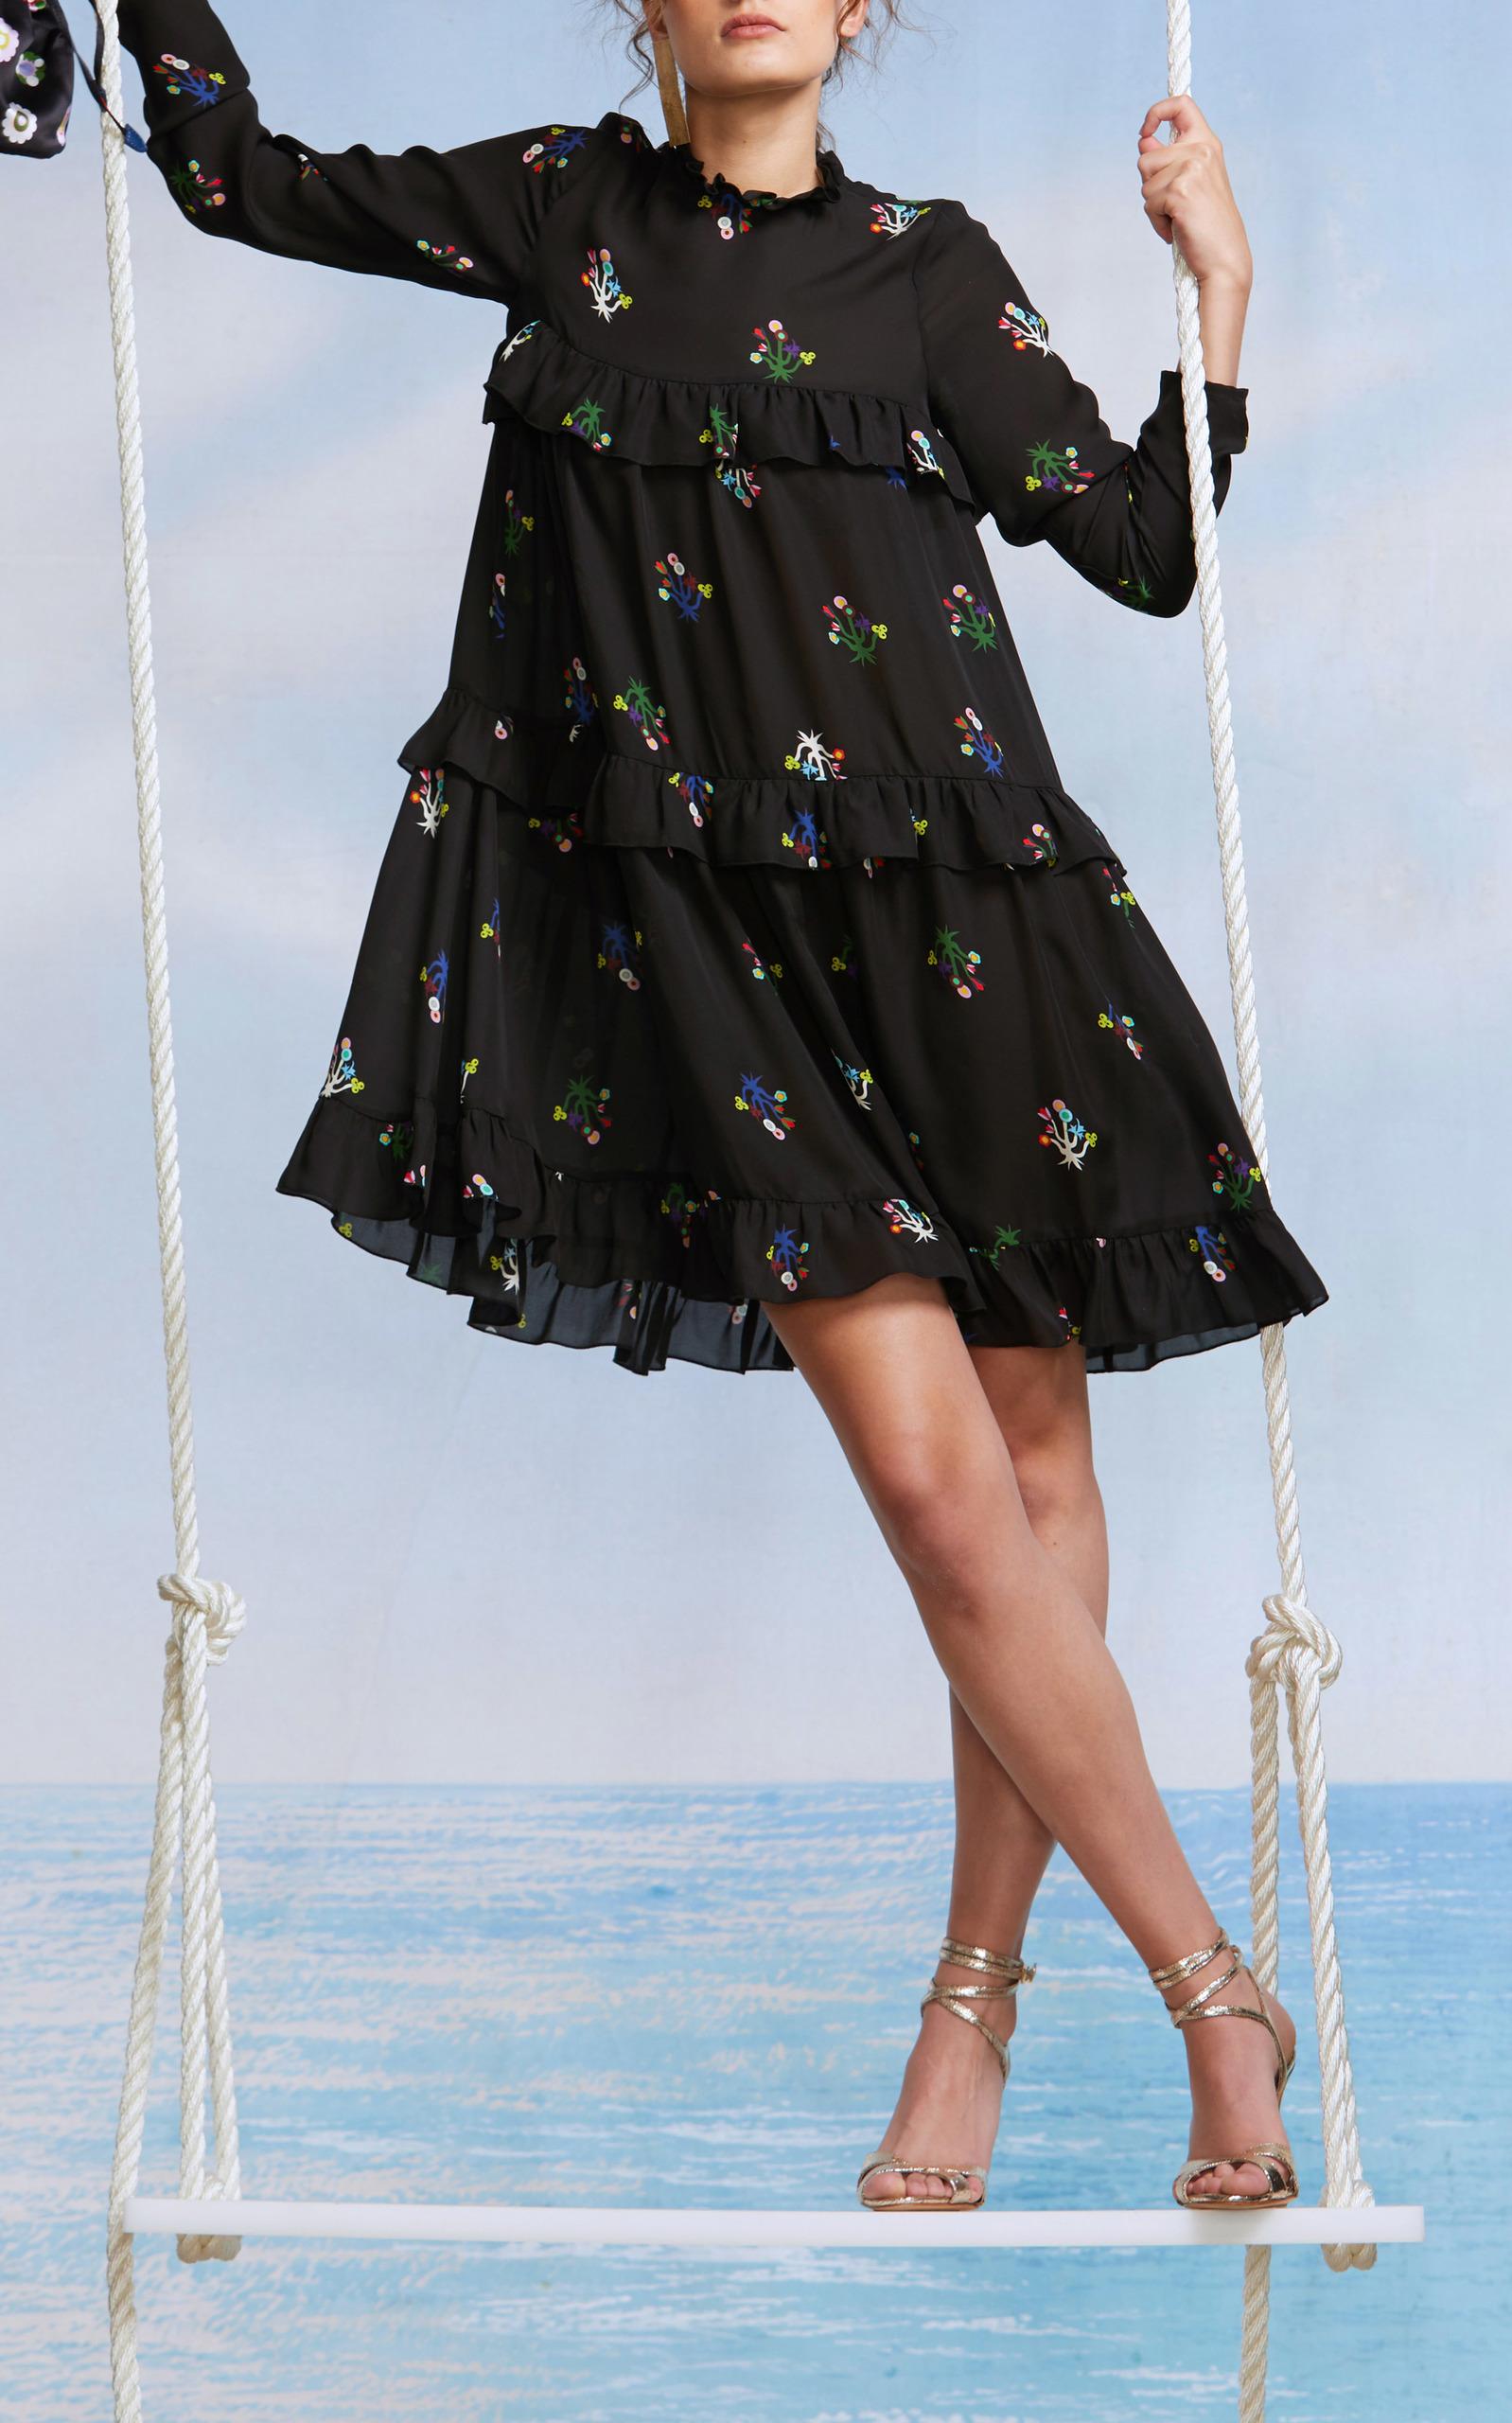 d1cb5b373e7 Cynthia RowleyHigh Tide Tiered Ruffle Dress. CLOSE. Loading